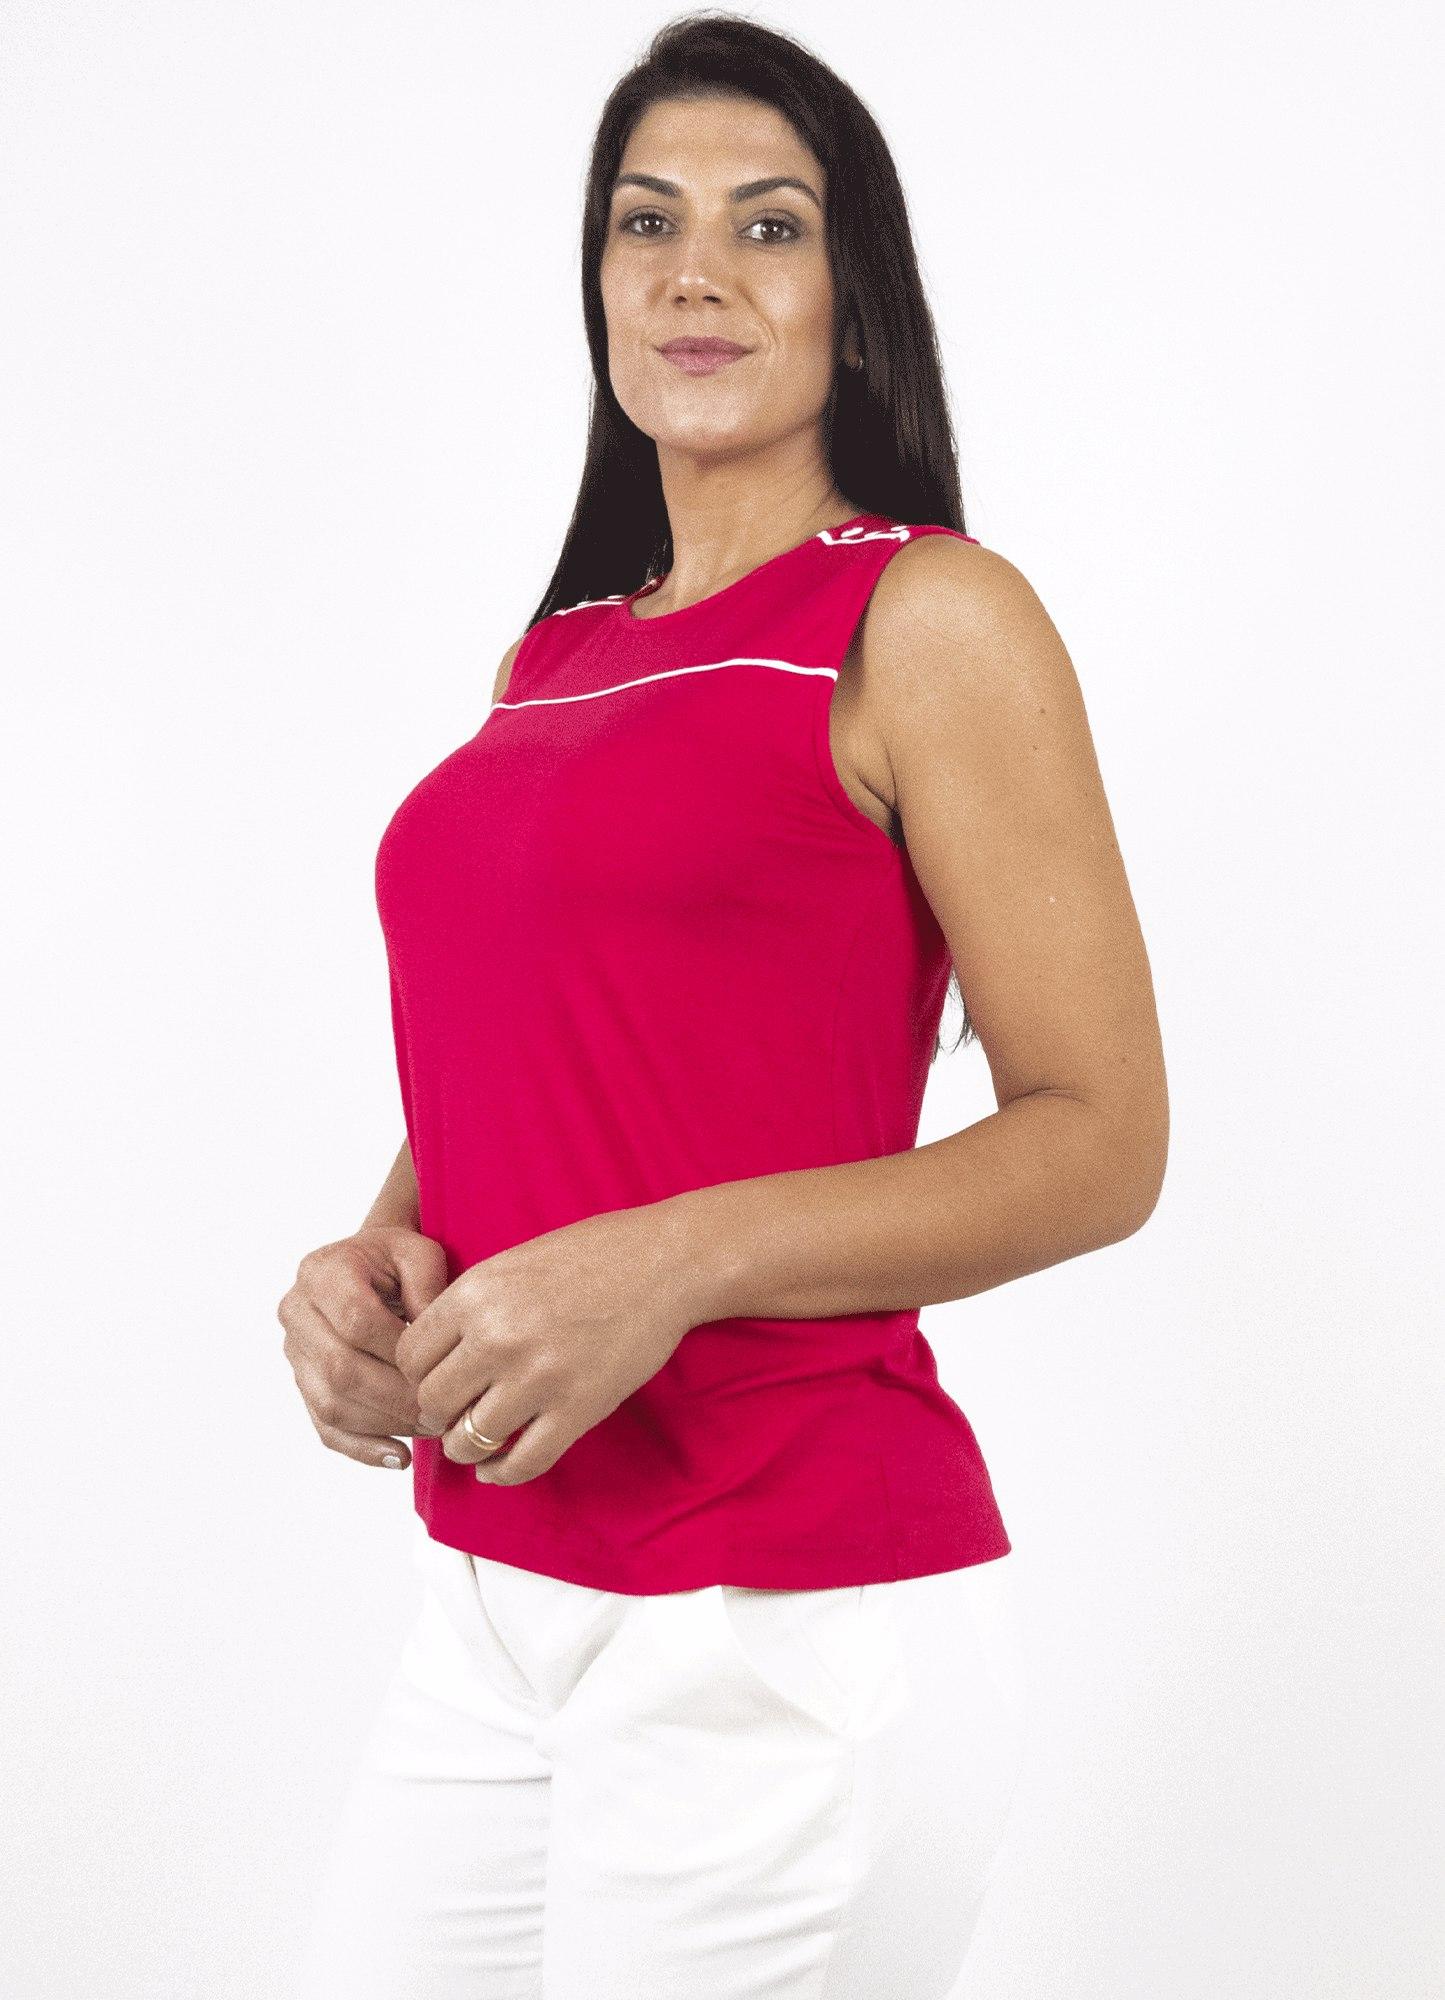 Blusa Feminina Plus Size Malha Rosa Decote Redondo Botão Decorativo no Ombro